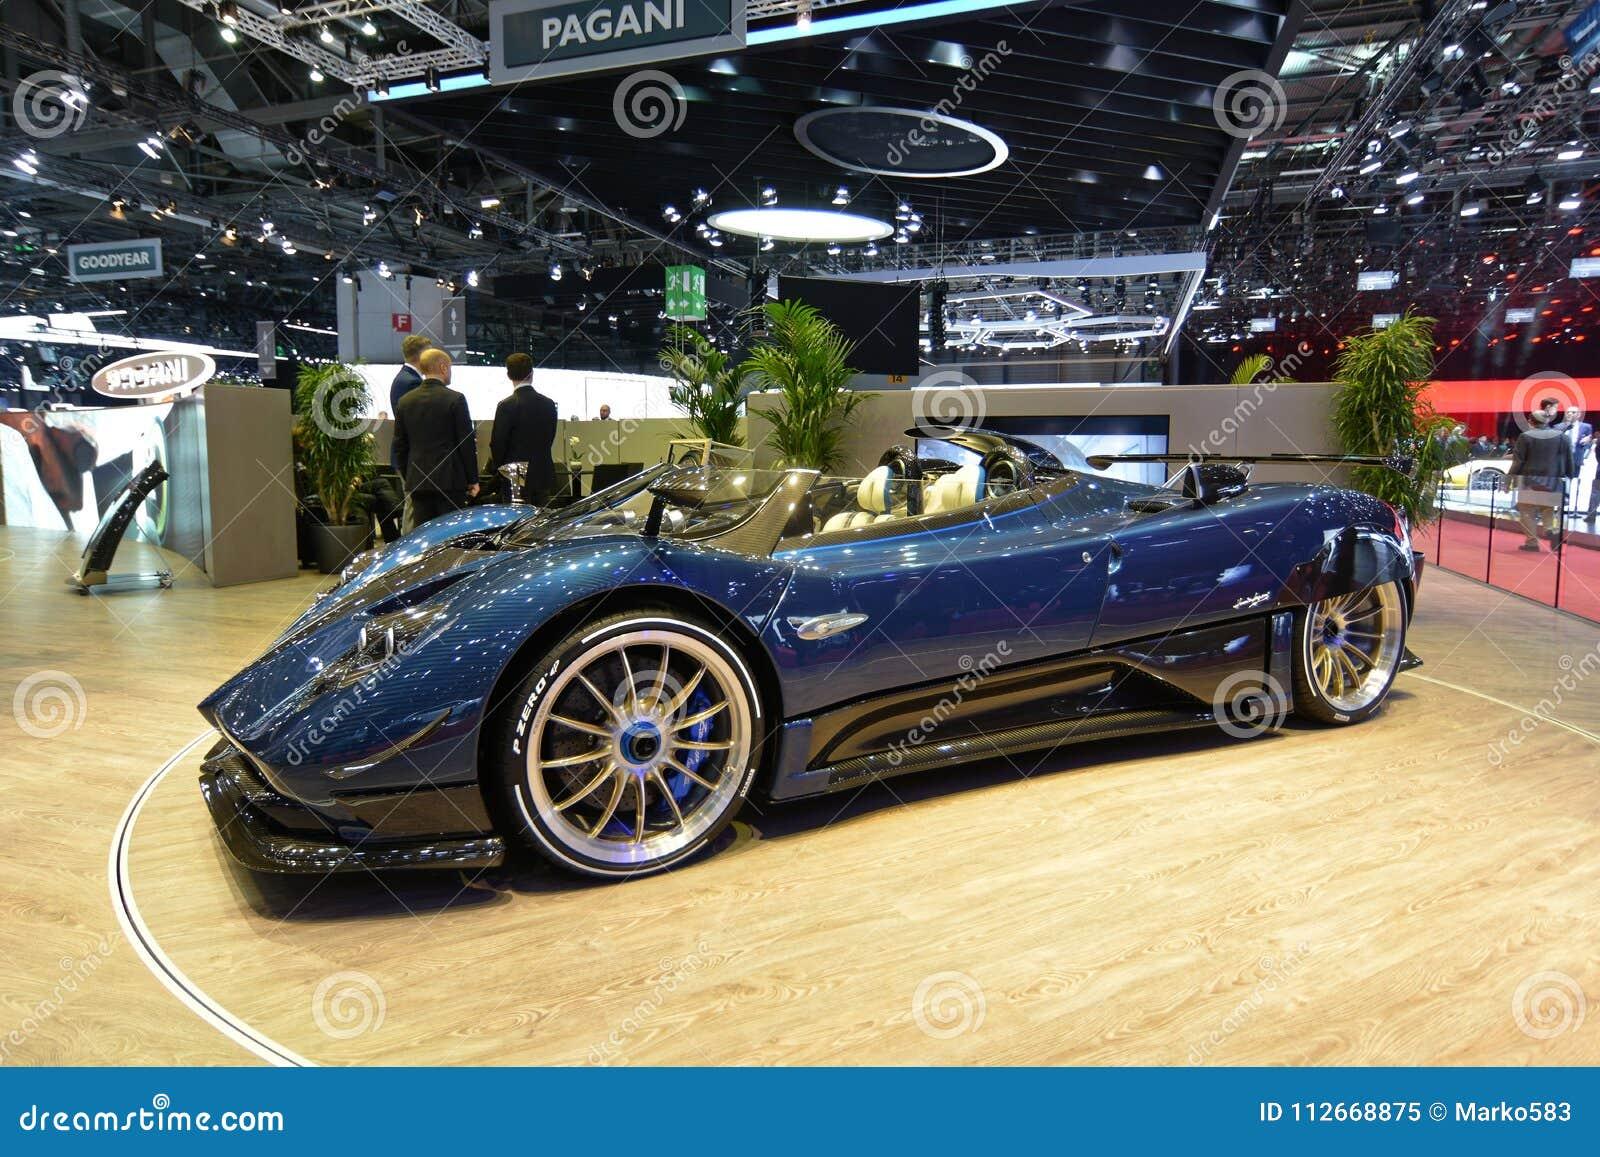 88th Exposicao Automovel Internacional 2018 De Genebra Pagani Zonda Hp Barchetta Imagem Editorial Imagem De Automovel Internacional 112668875